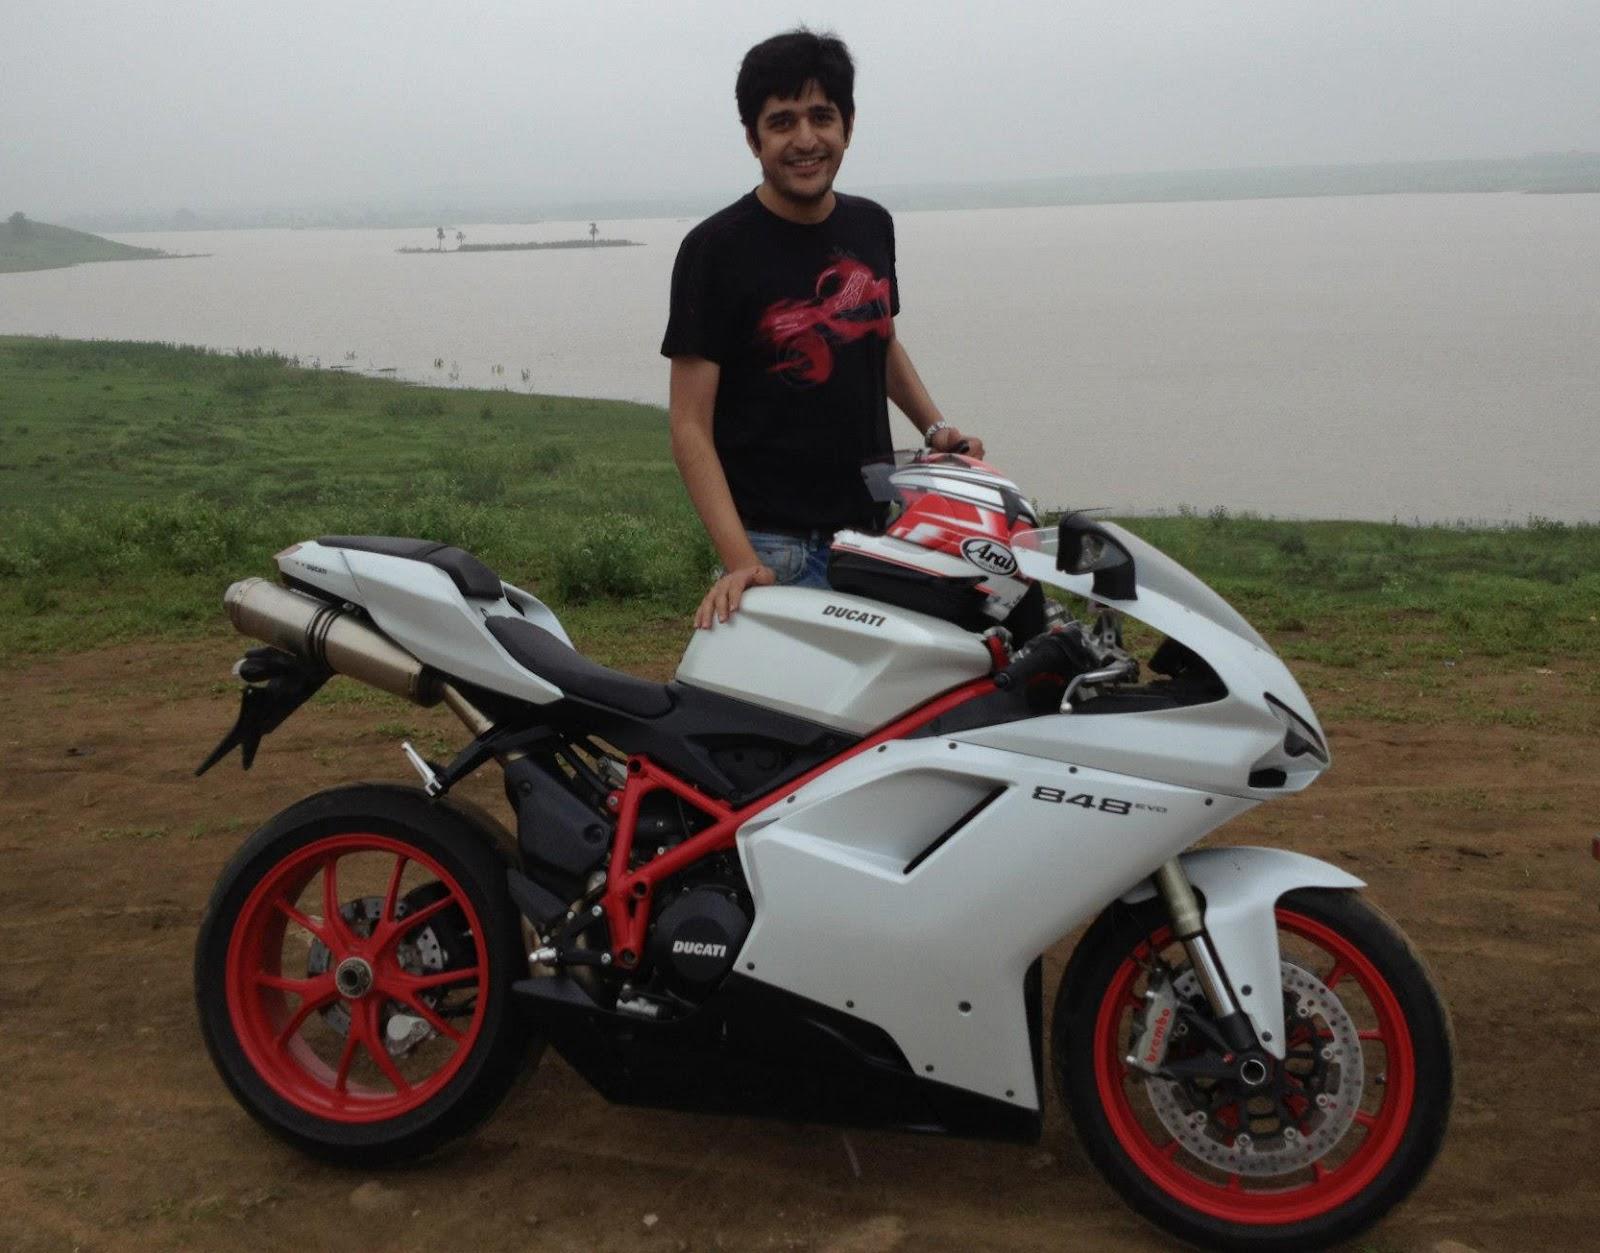 Life With A Superbike: 59. Samyak's Ducati 848 Evo, 2012